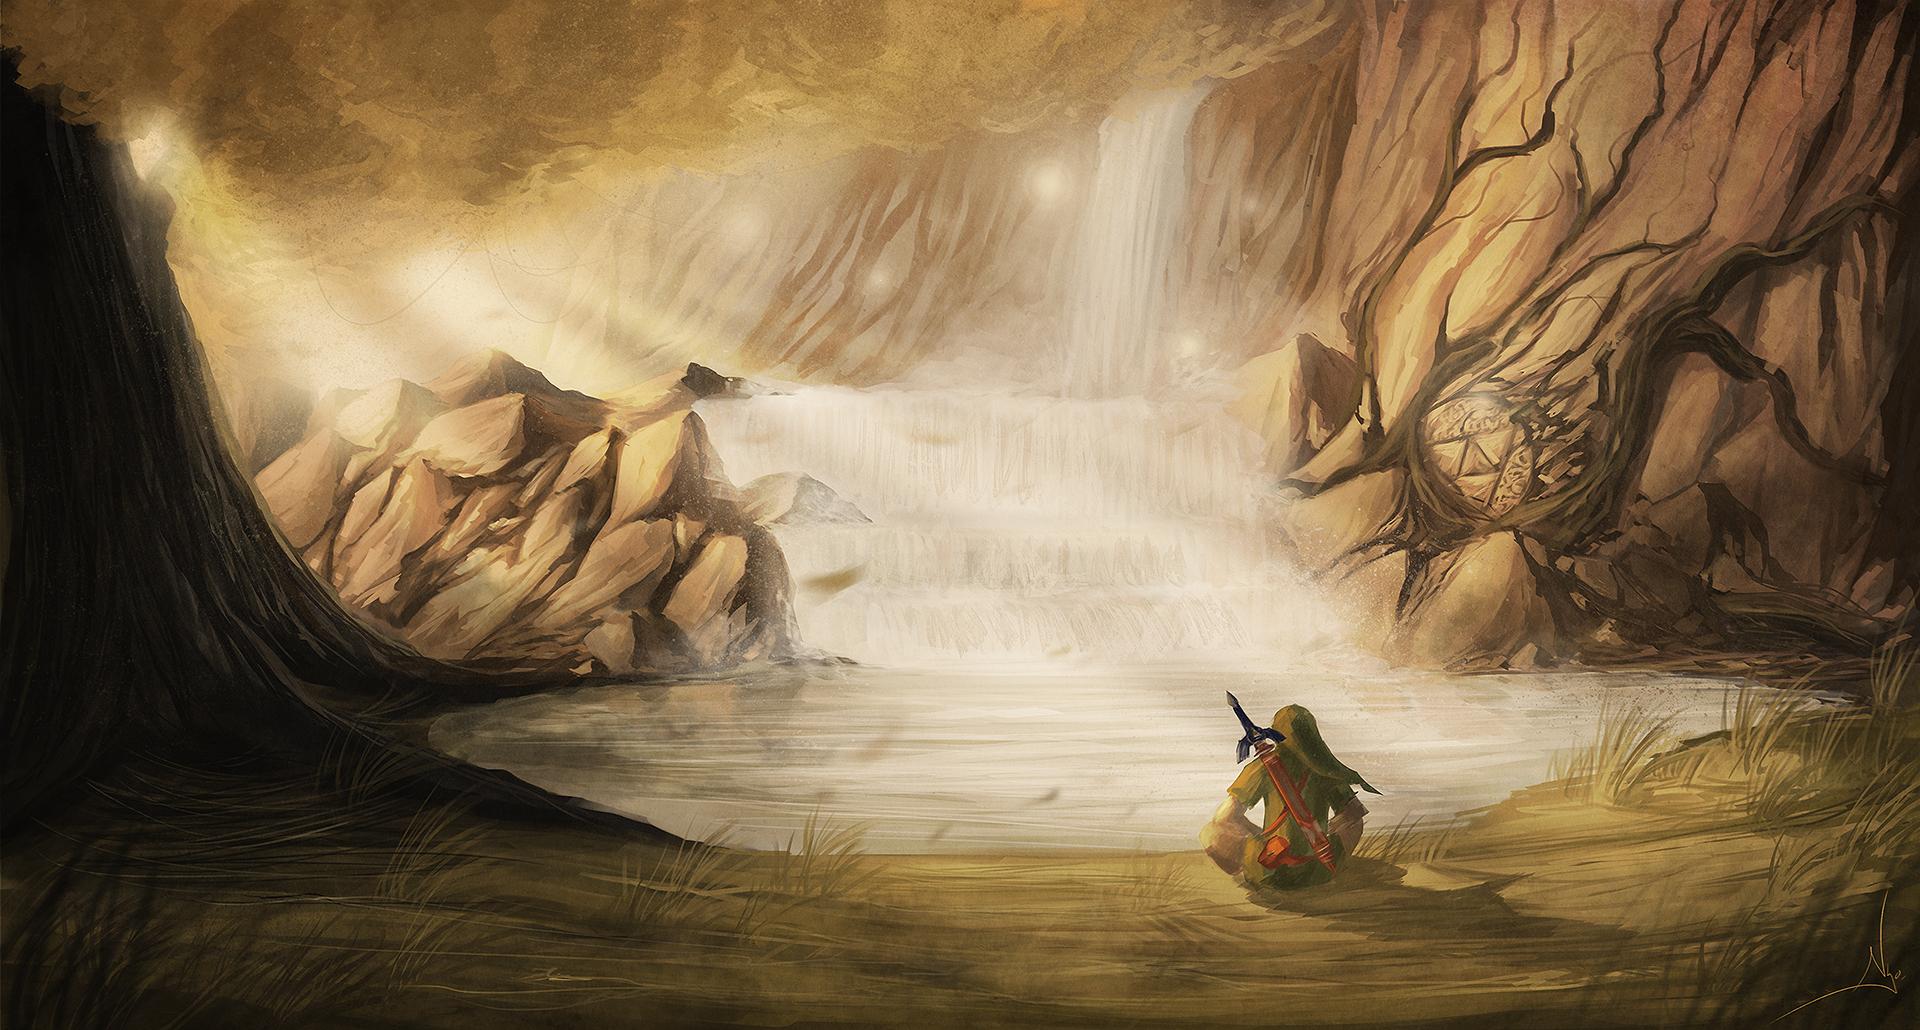 Free Download Legend Of Zelda Twilight Princess Wallpaper 1920x1030